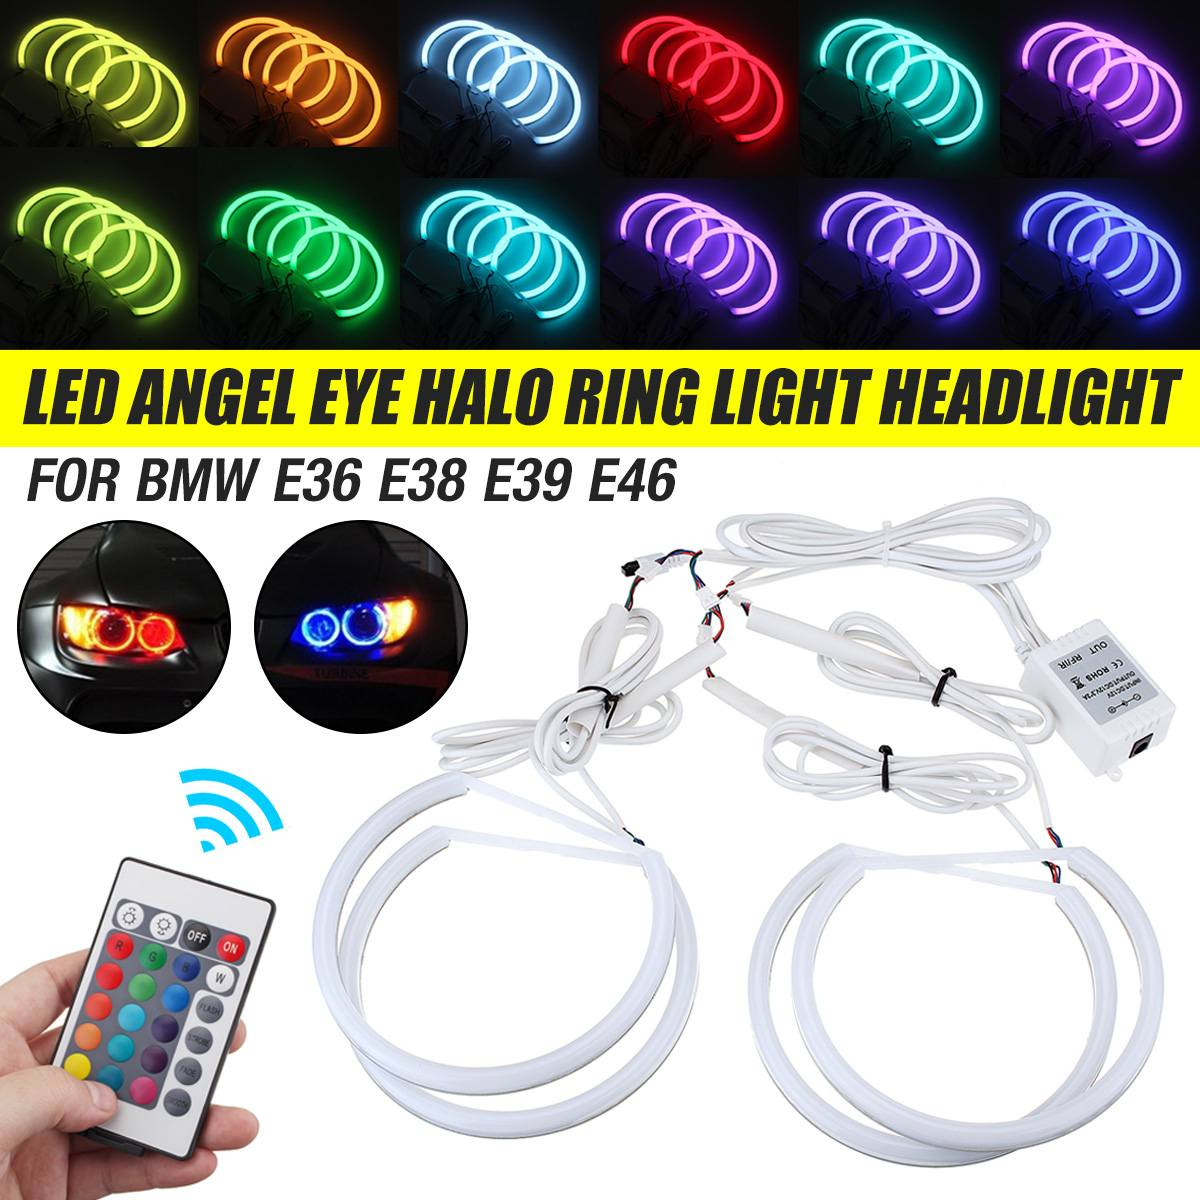 4x131mm Multi-Color RGB LED Angel Eye Halo Ring Light Headlight Cotton Lights Car Light Accessories For BMW E36 E38 E39 E46